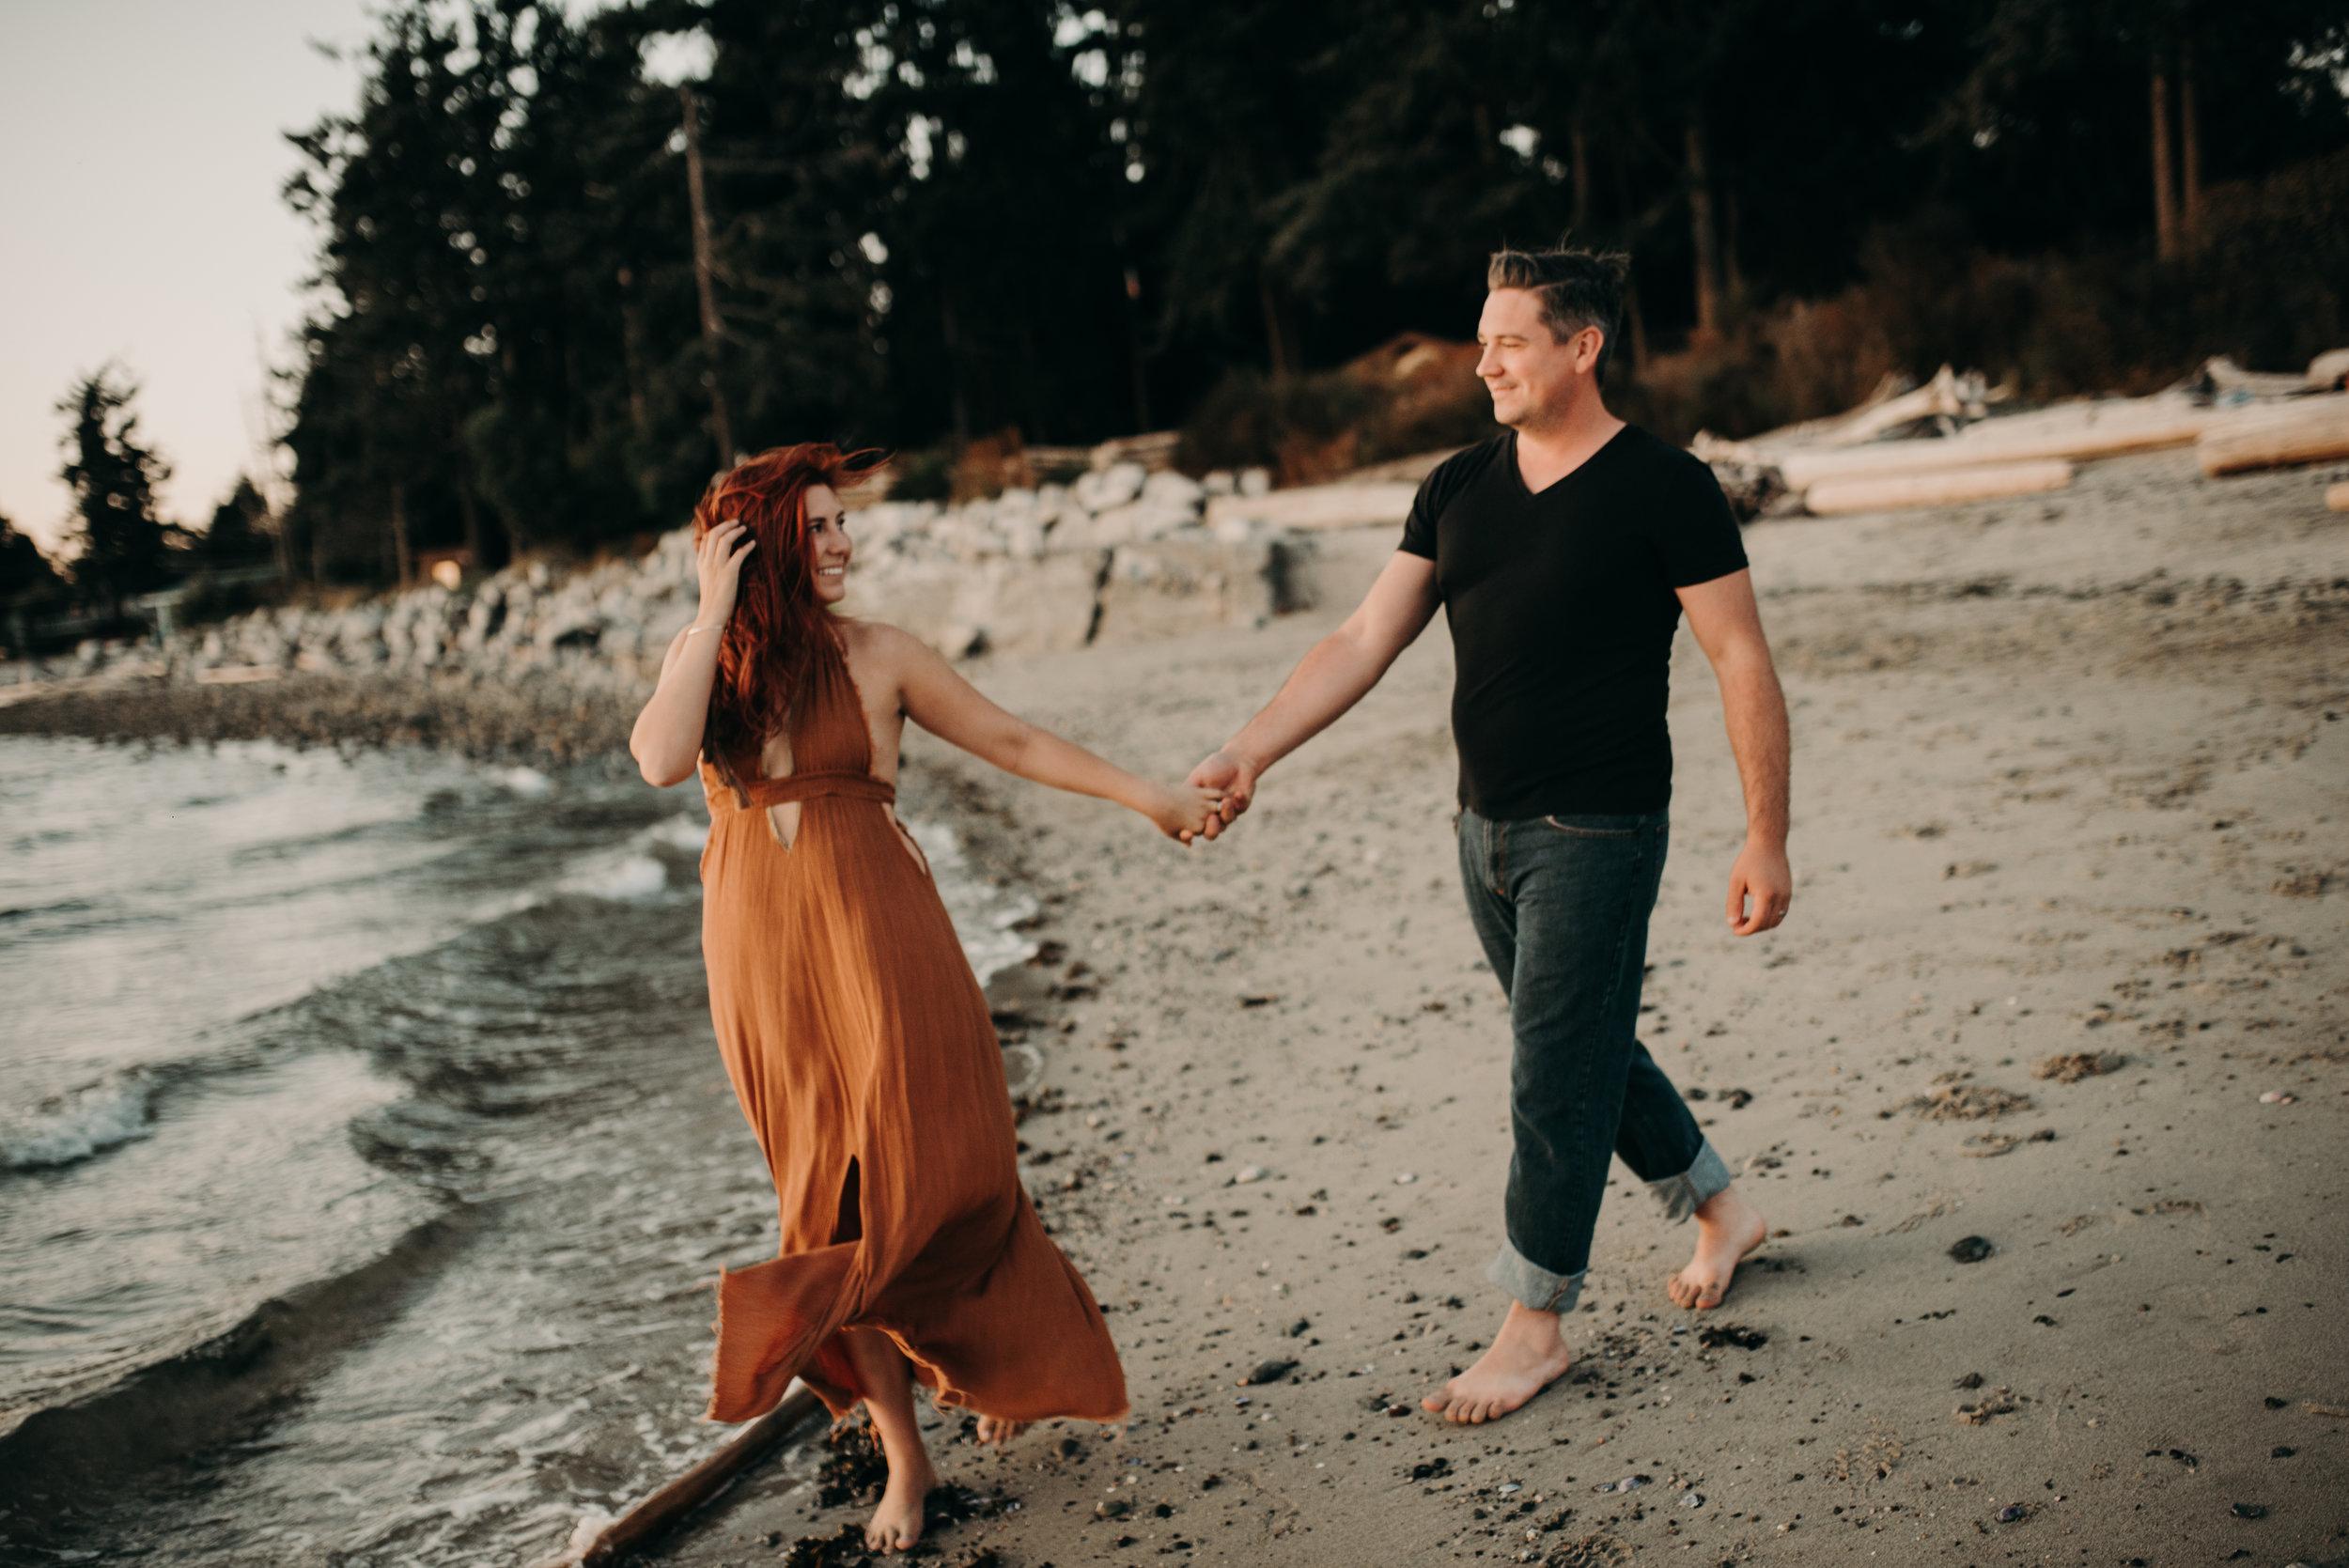 Kaylyn&SeanSeptember13,2017-LauraOlsonPhotography-SunshineCoastBCPhotographer-0942.jpg